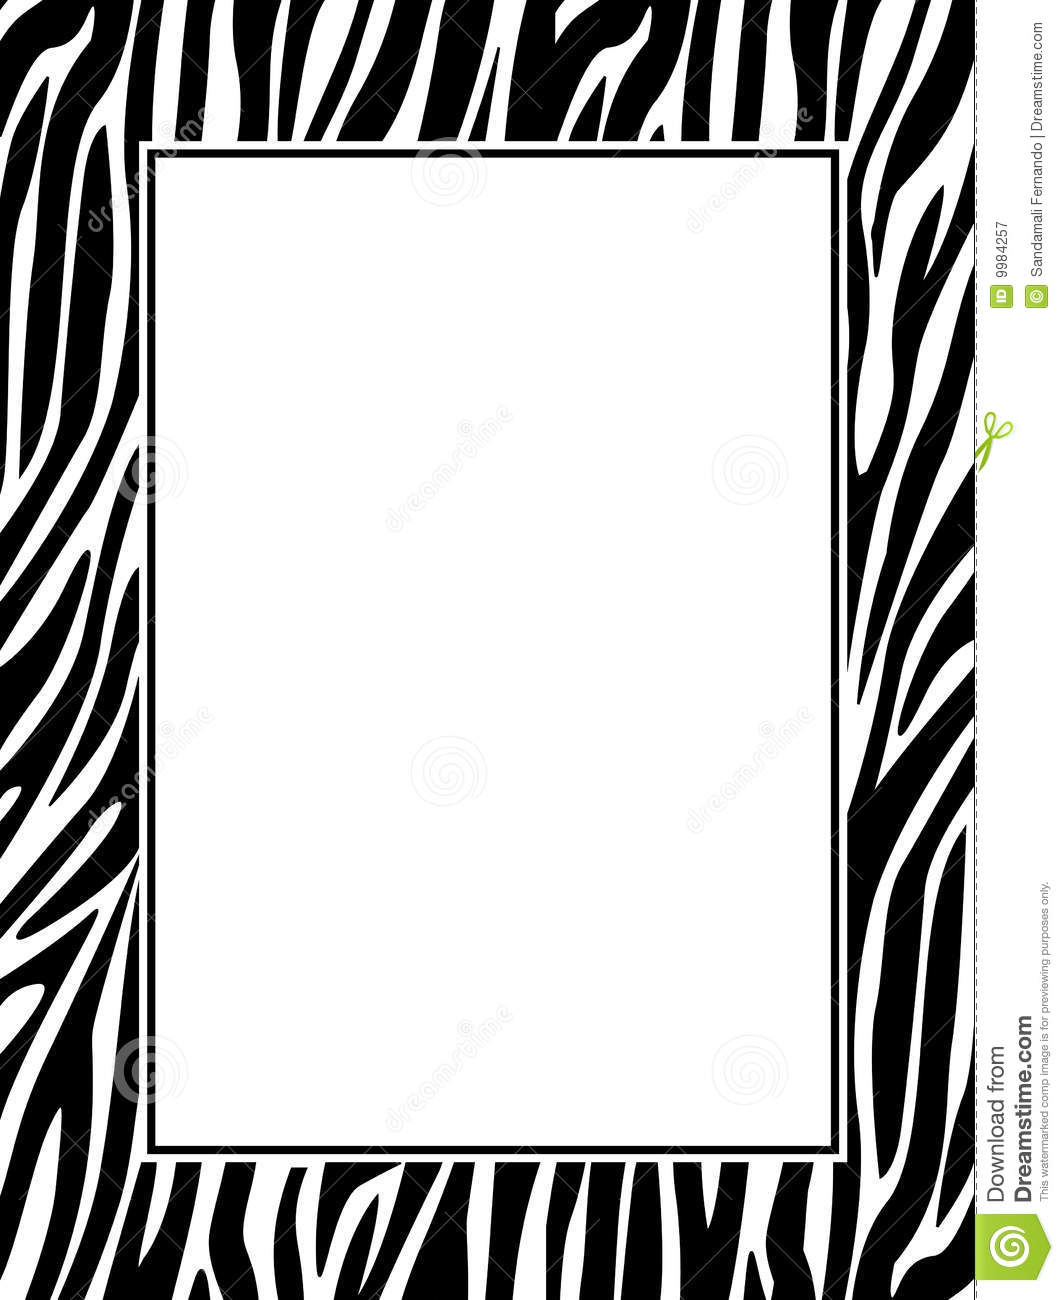 clip art animal print - photo #34